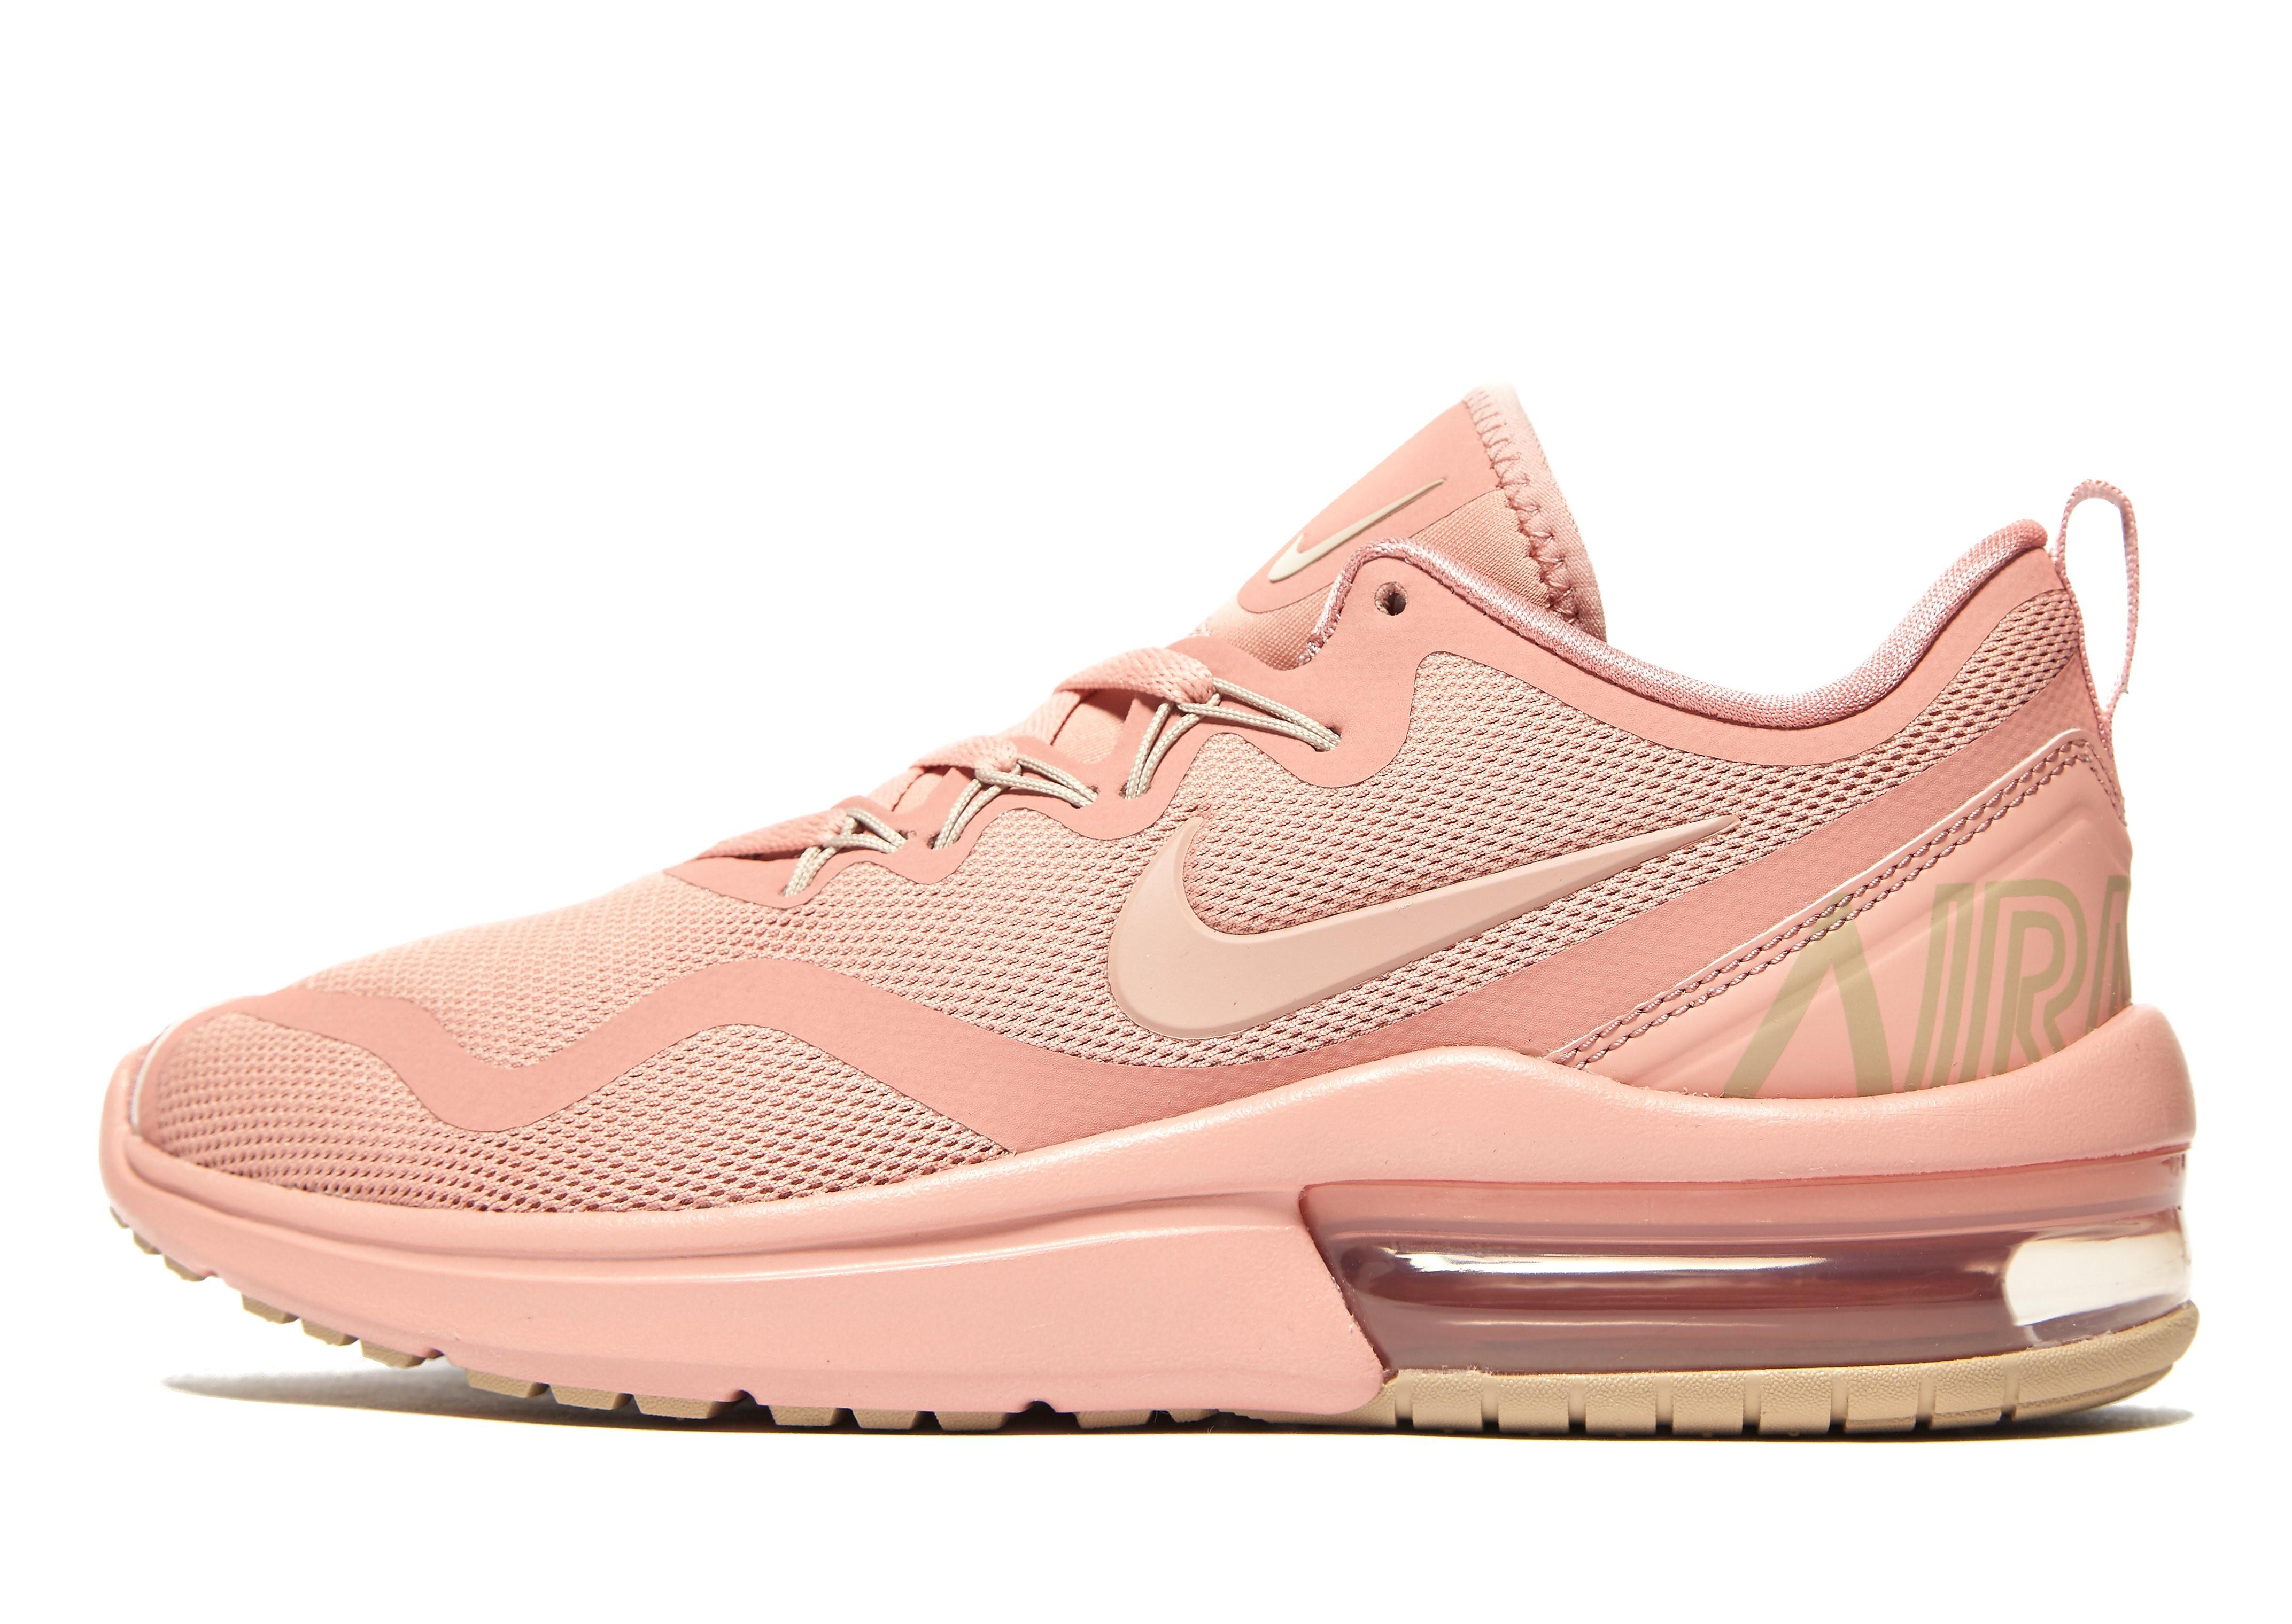 Nike Air Max Fury Women's